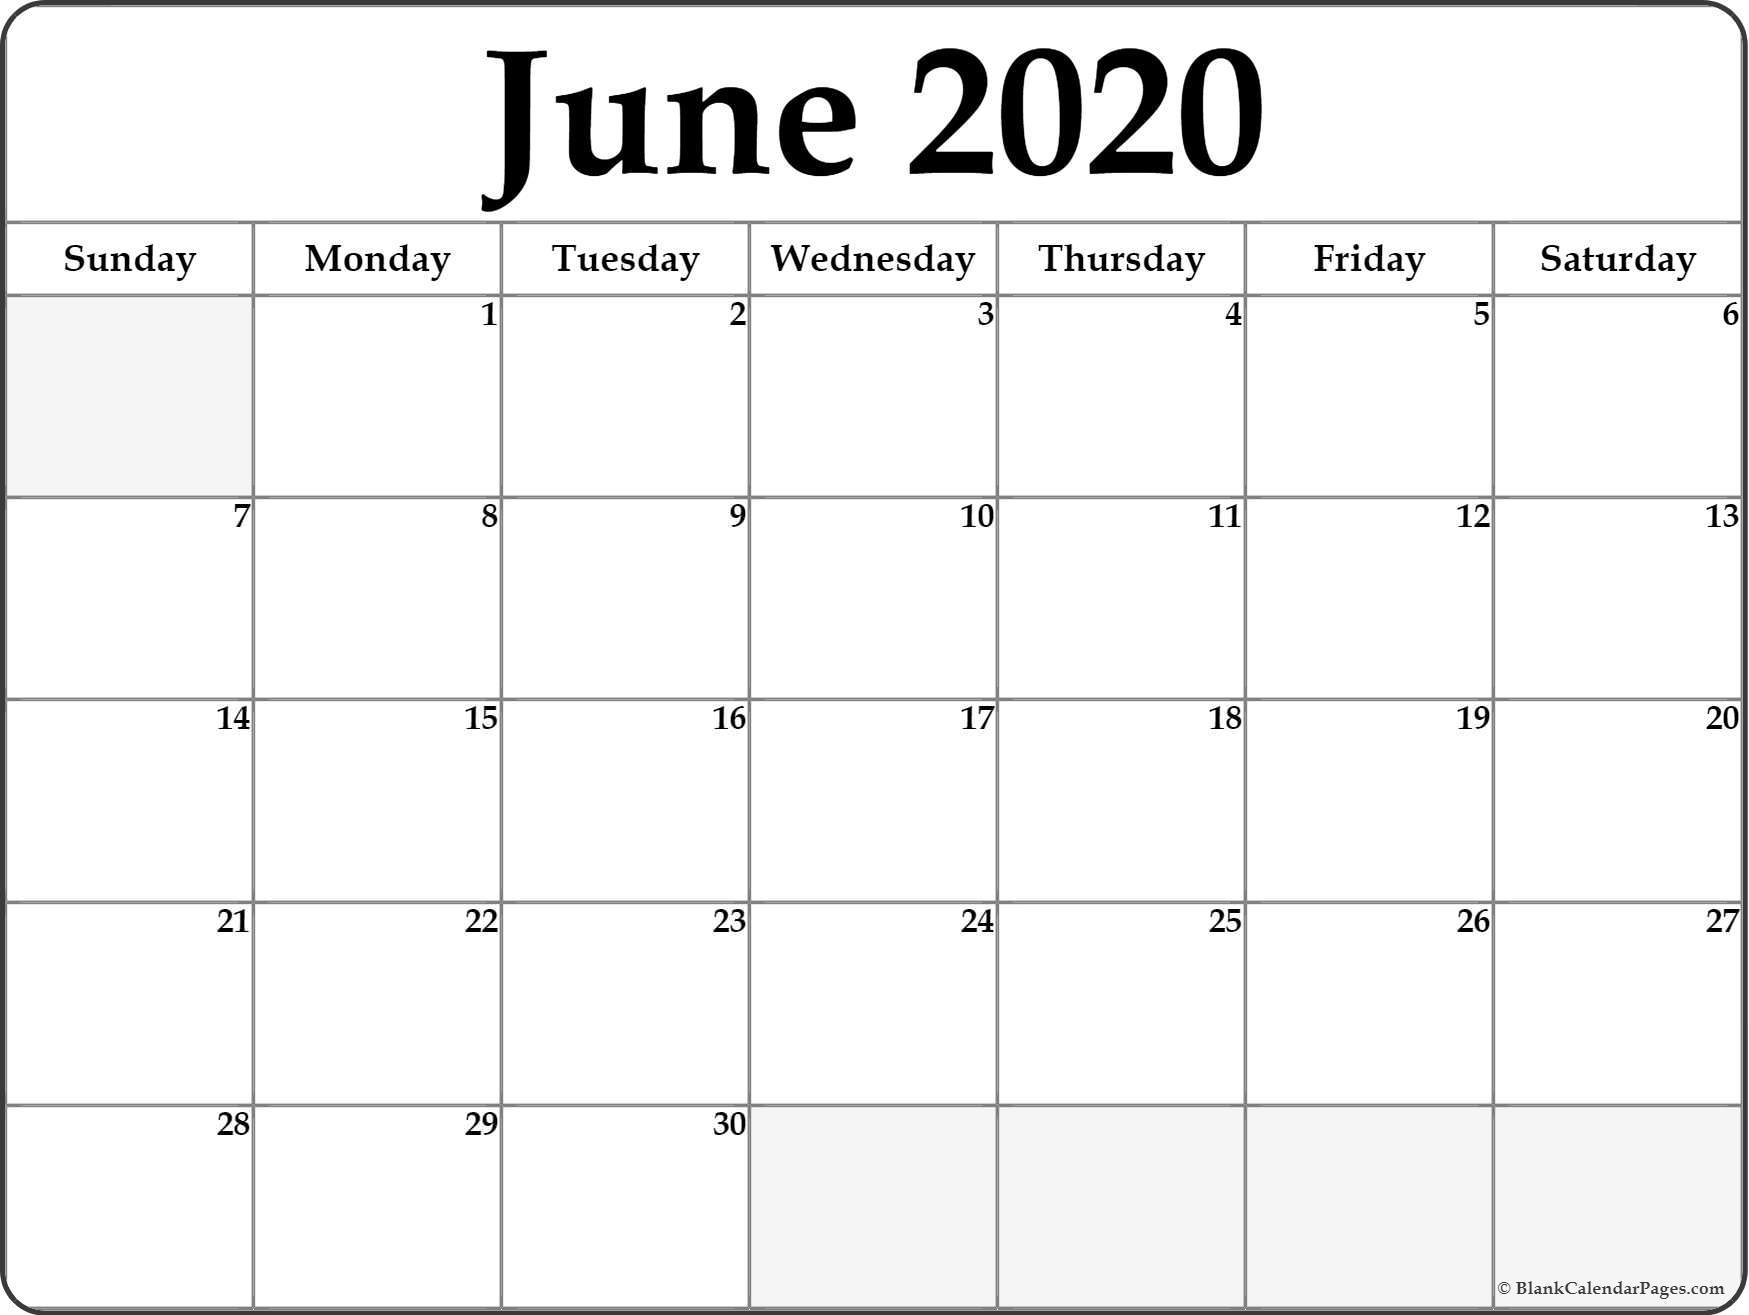 June 2020 Calendar | Free Printable Monthly Calendars with regard to Free Printed Calendars From June 2019 To June 2020